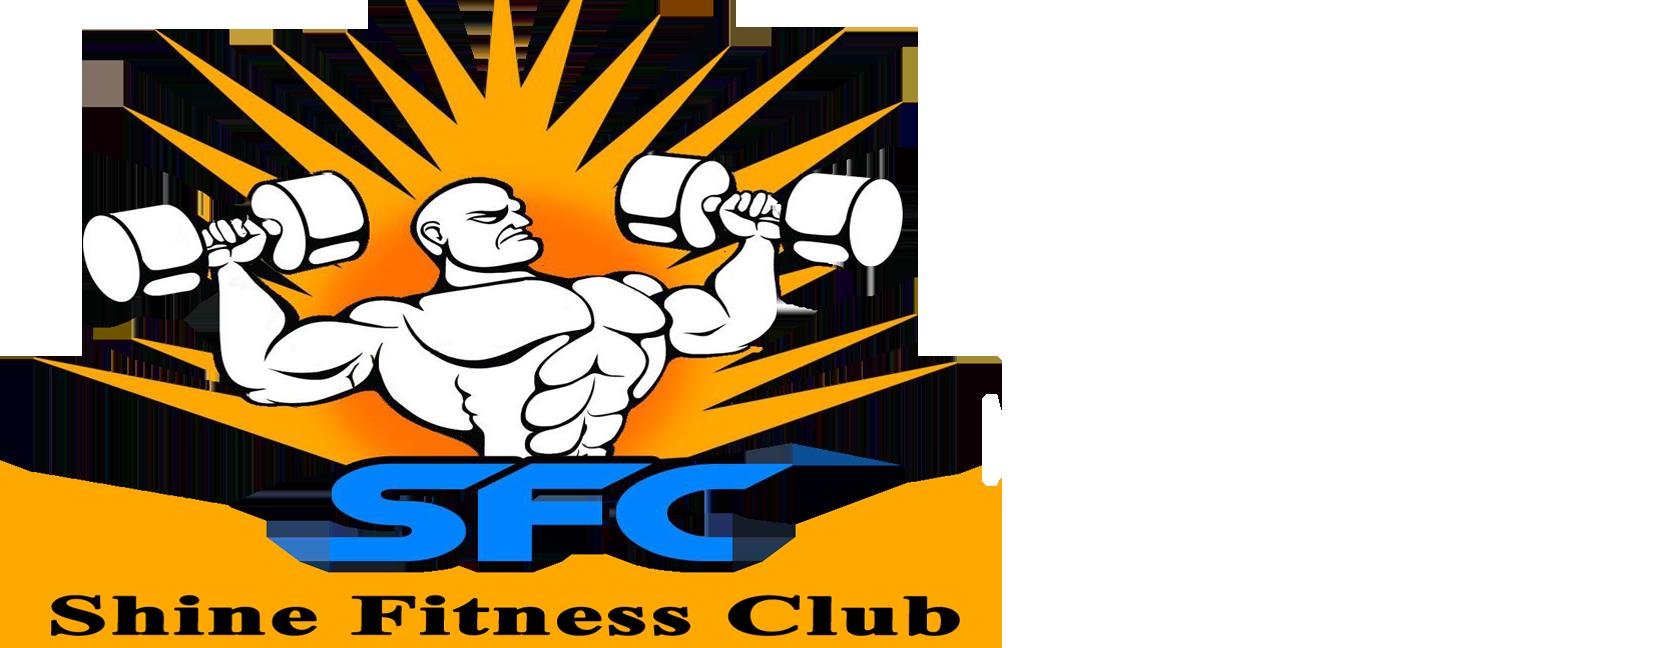 Shine fitness club best. Gym clipart gymnasium building